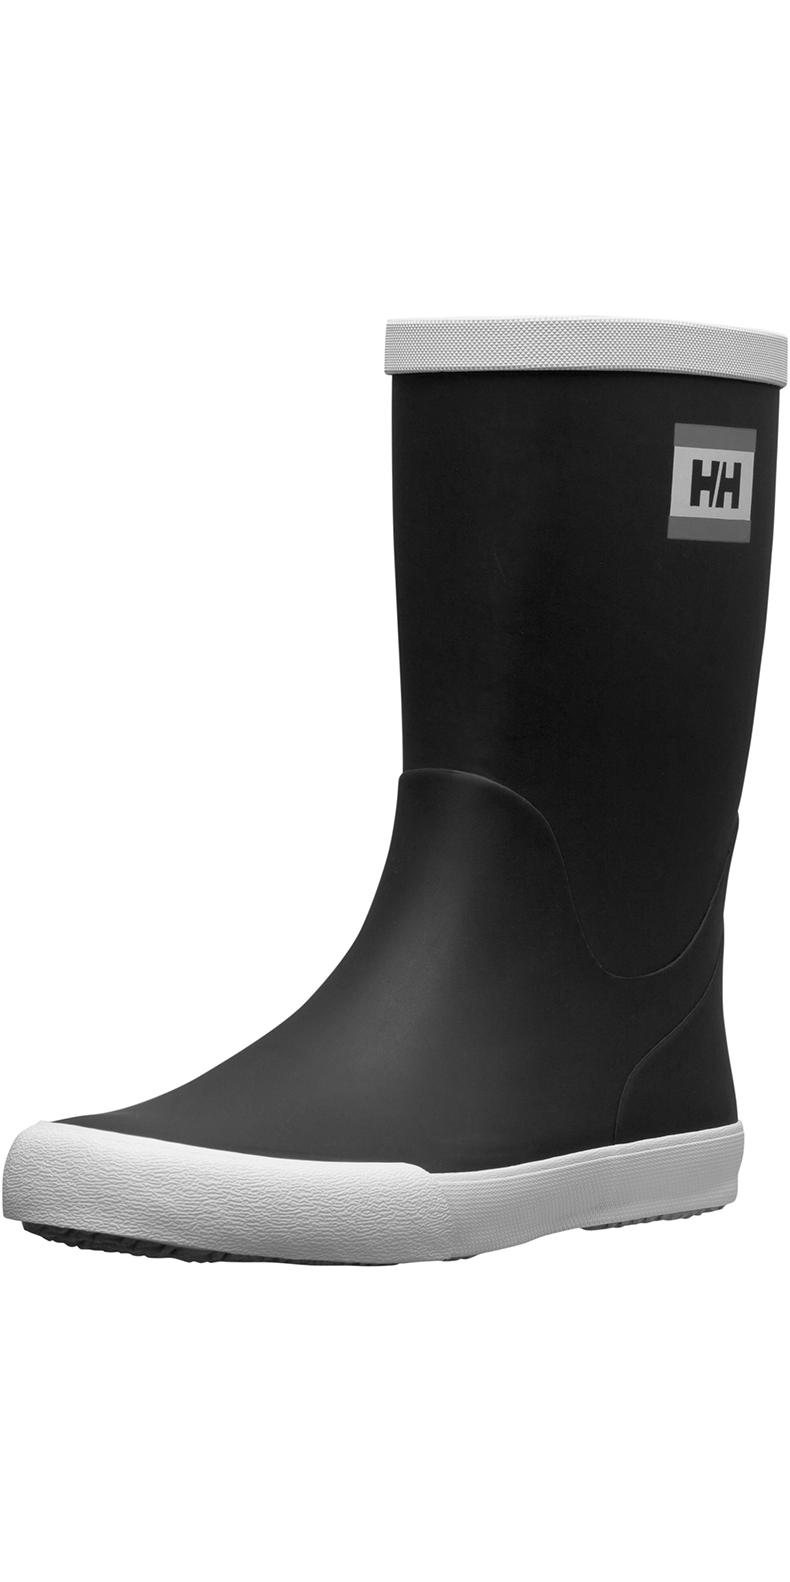 2018 Helly Hansen Nordvik Boot Black / Off White 11198